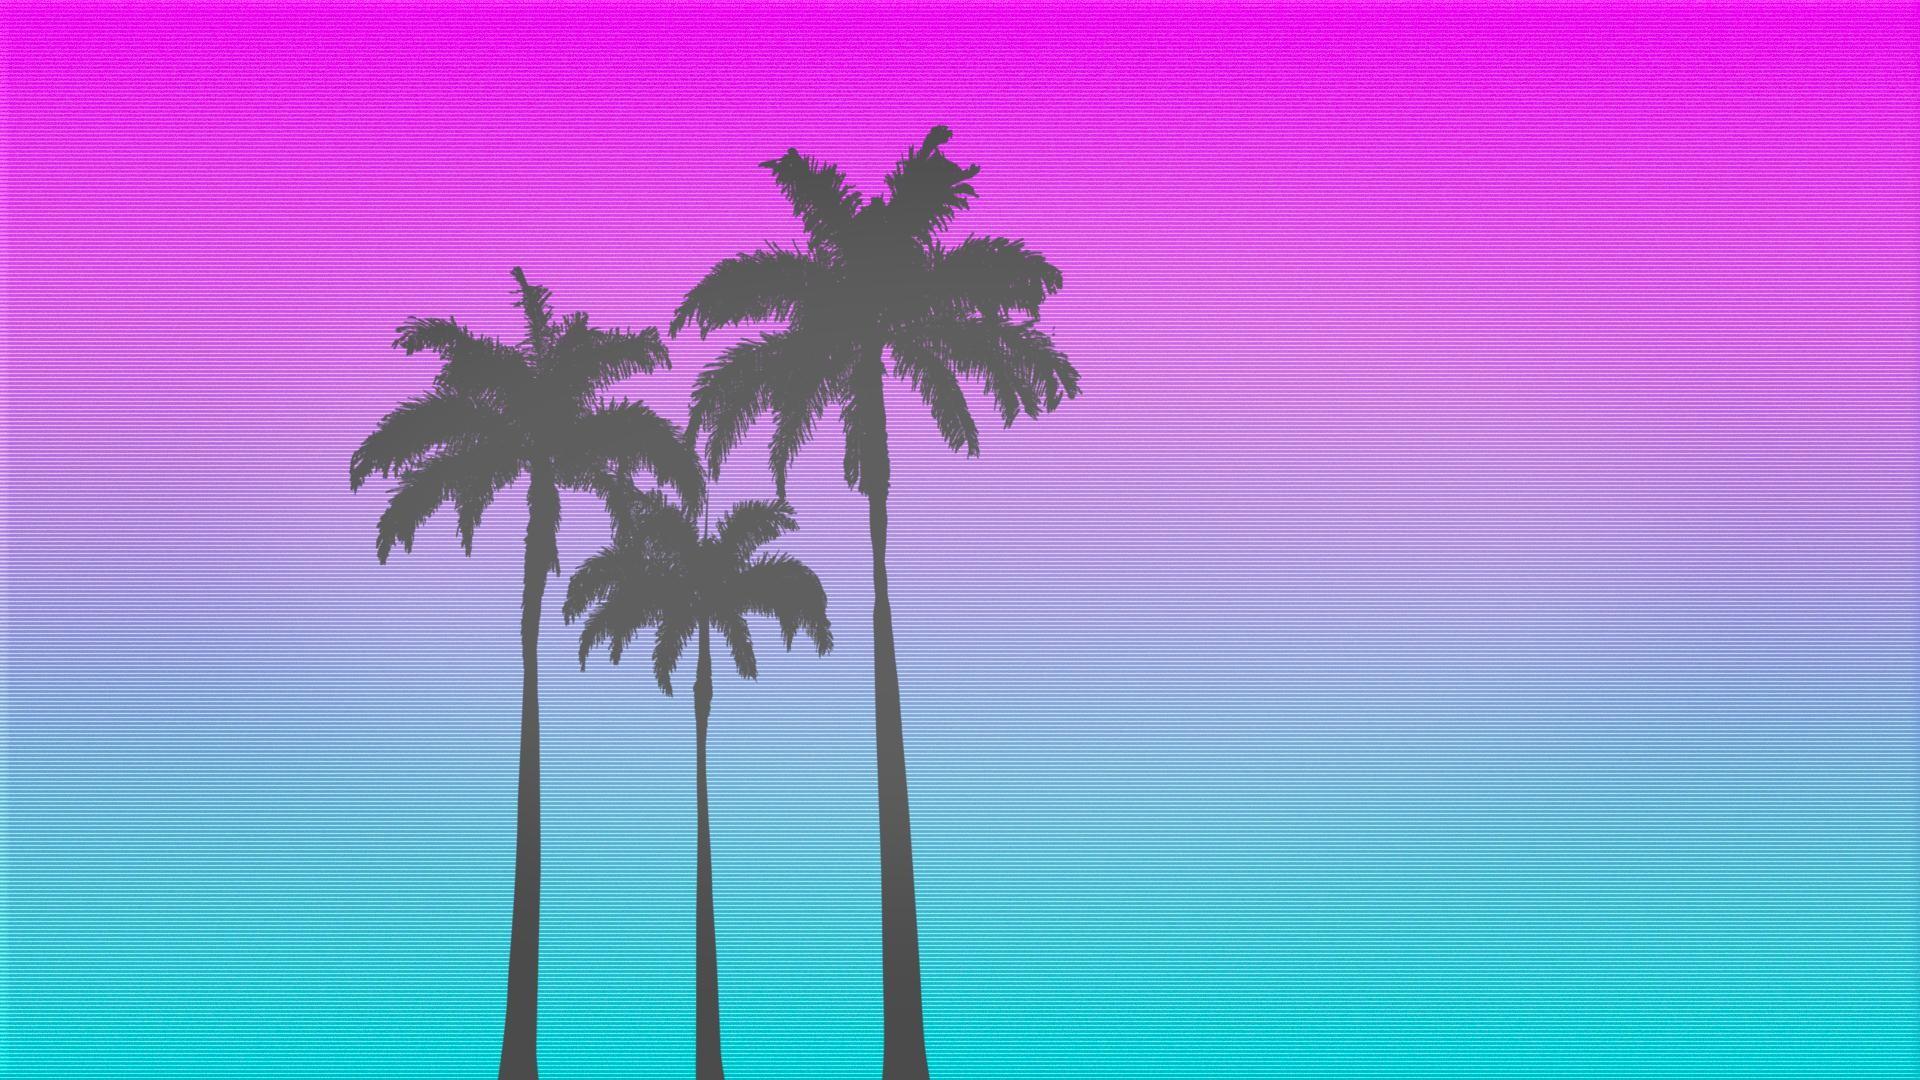 ARTI made a simplistic Hotline Miami inspired wallpaper …